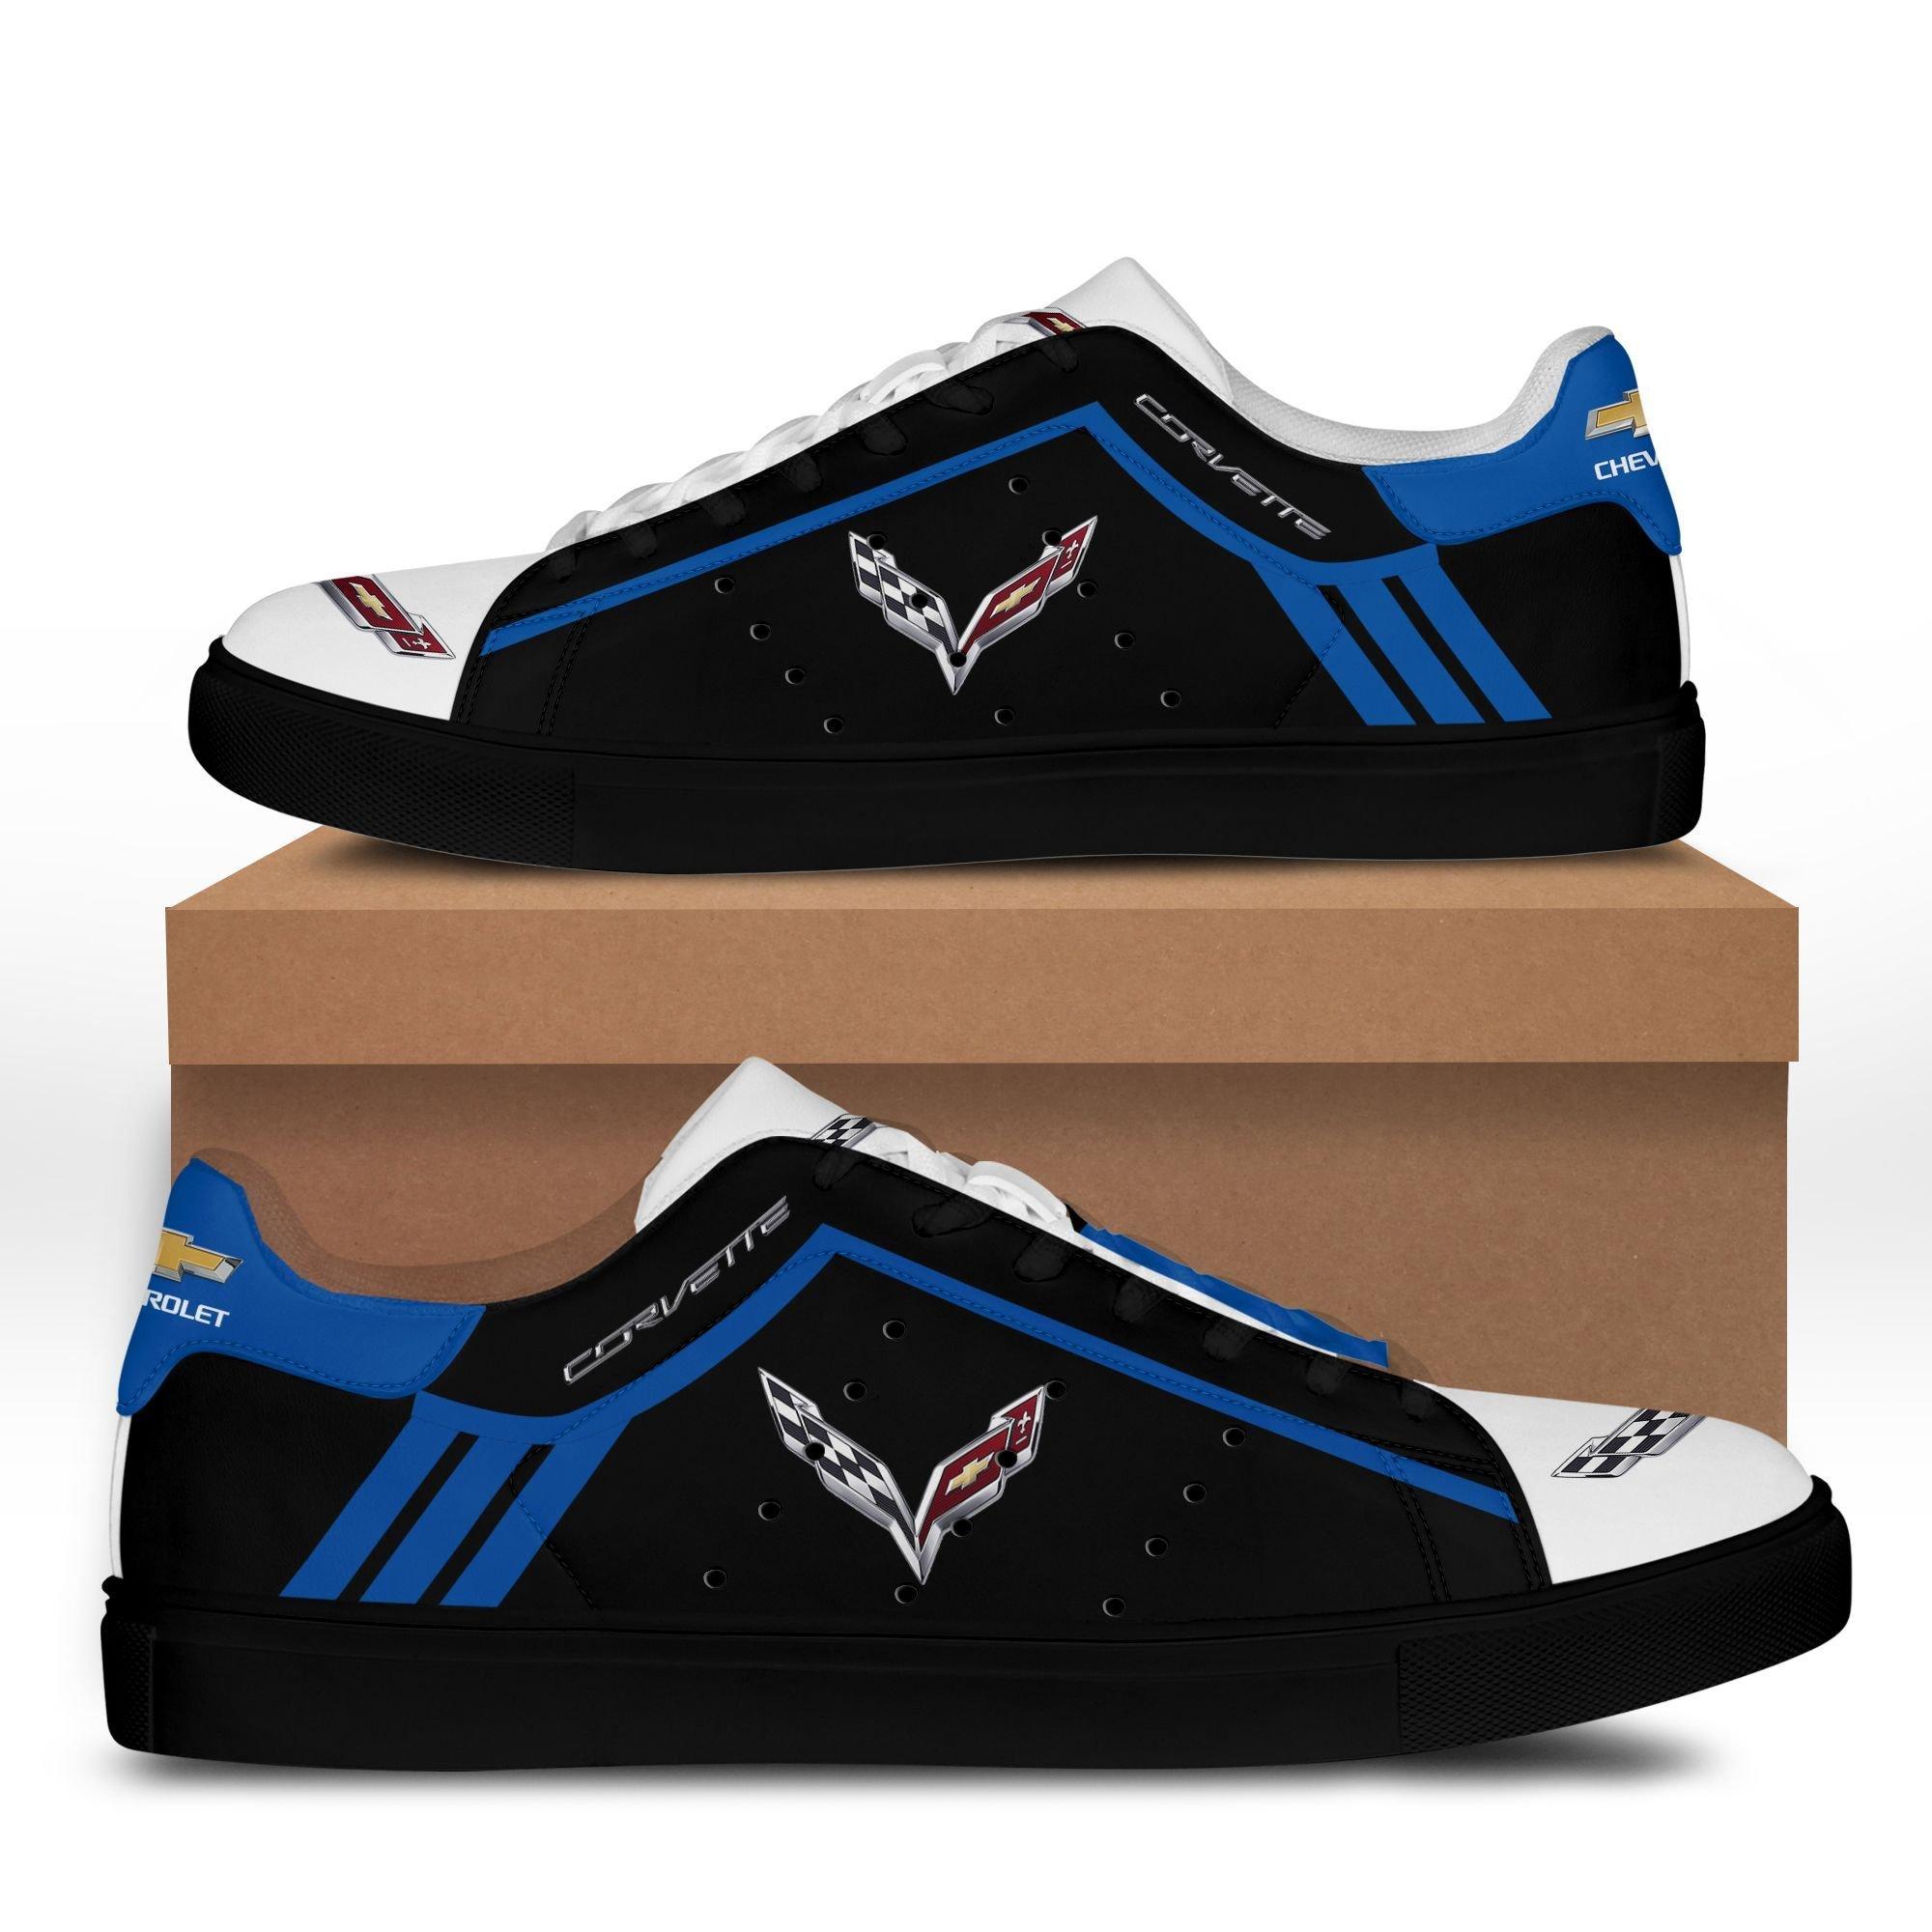 Chevrolet Corvette Blue lines in Black Stan Smith Shoes